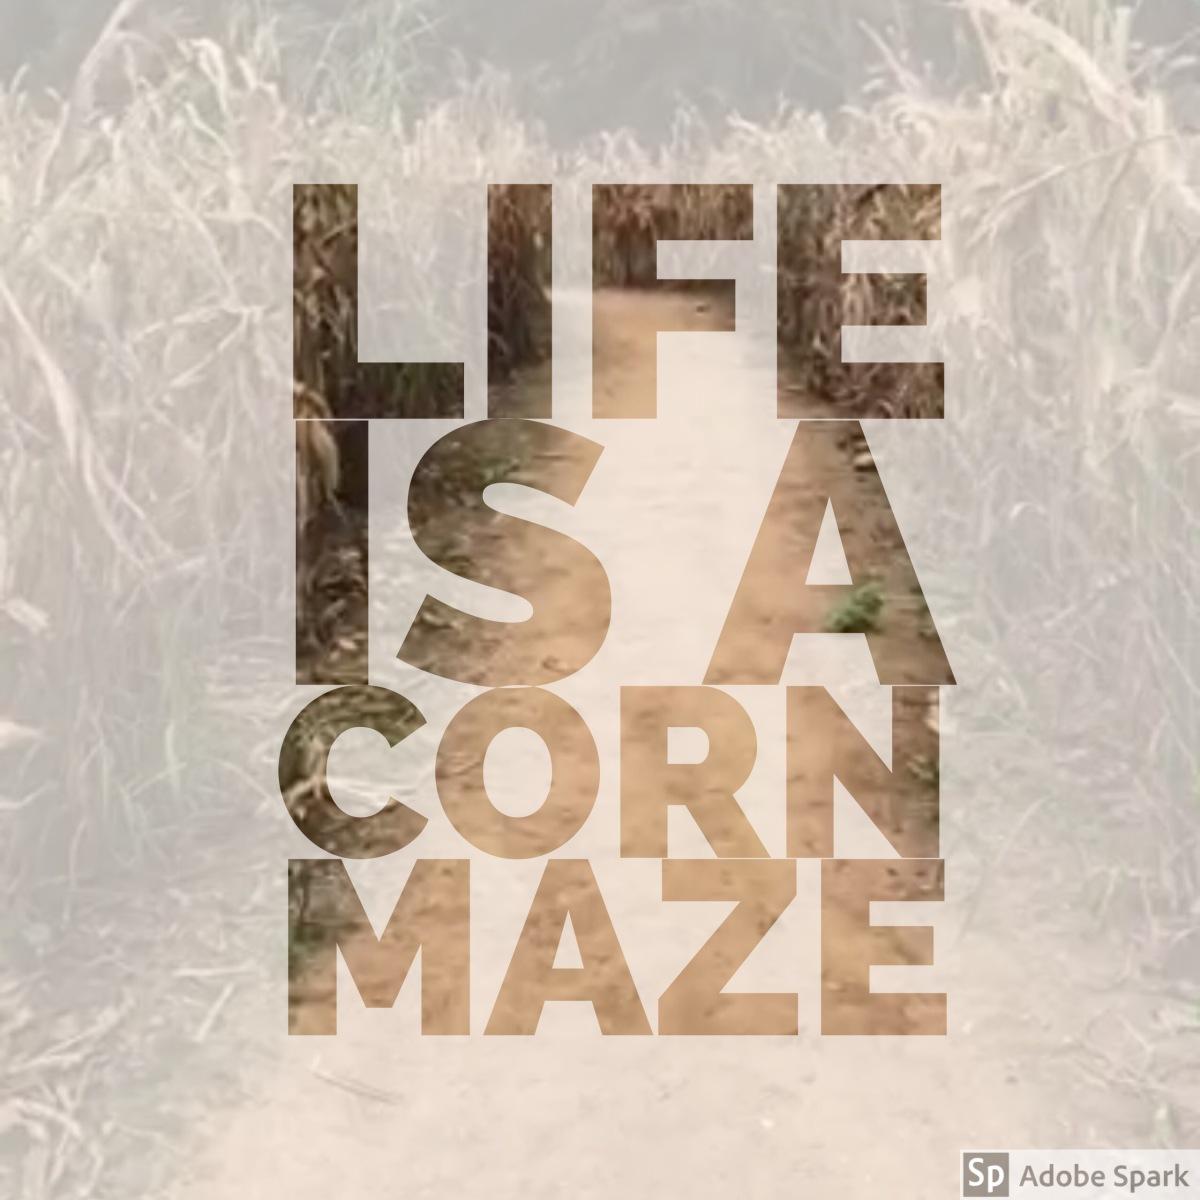 Life is a CornMaze